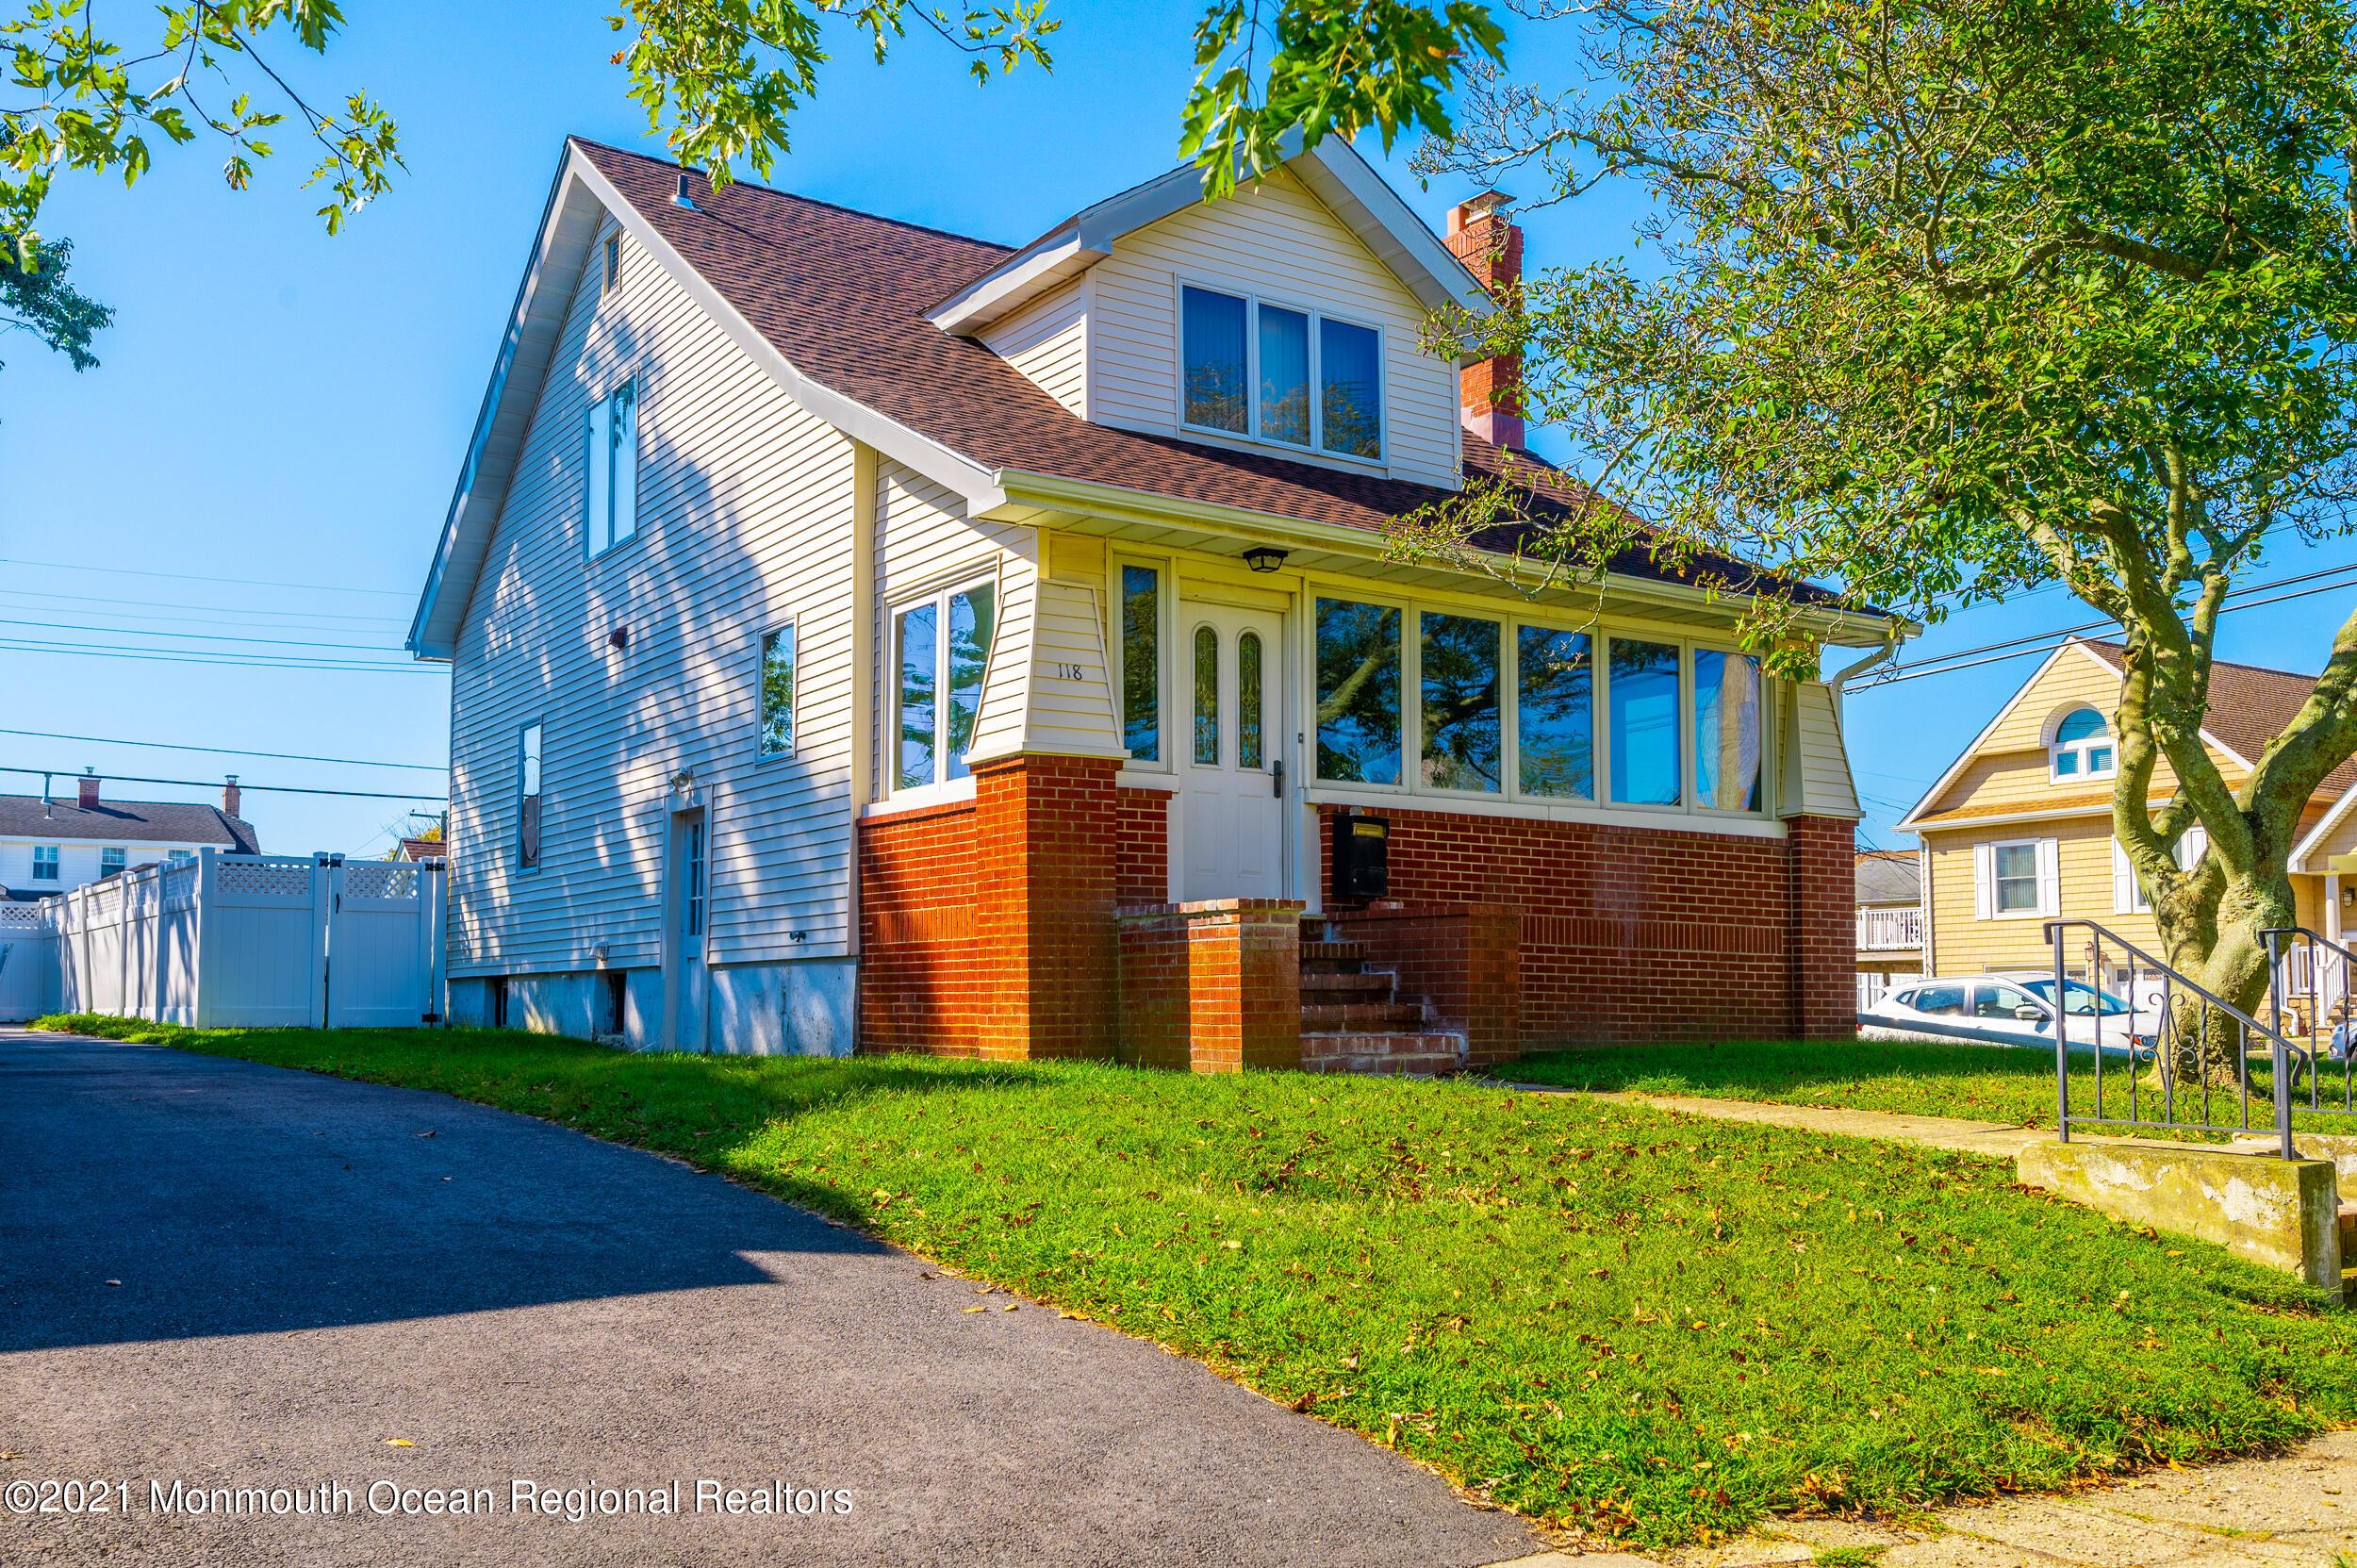 Photo of 118 Niblick Street, Point Pleasant Beach, NJ 08742